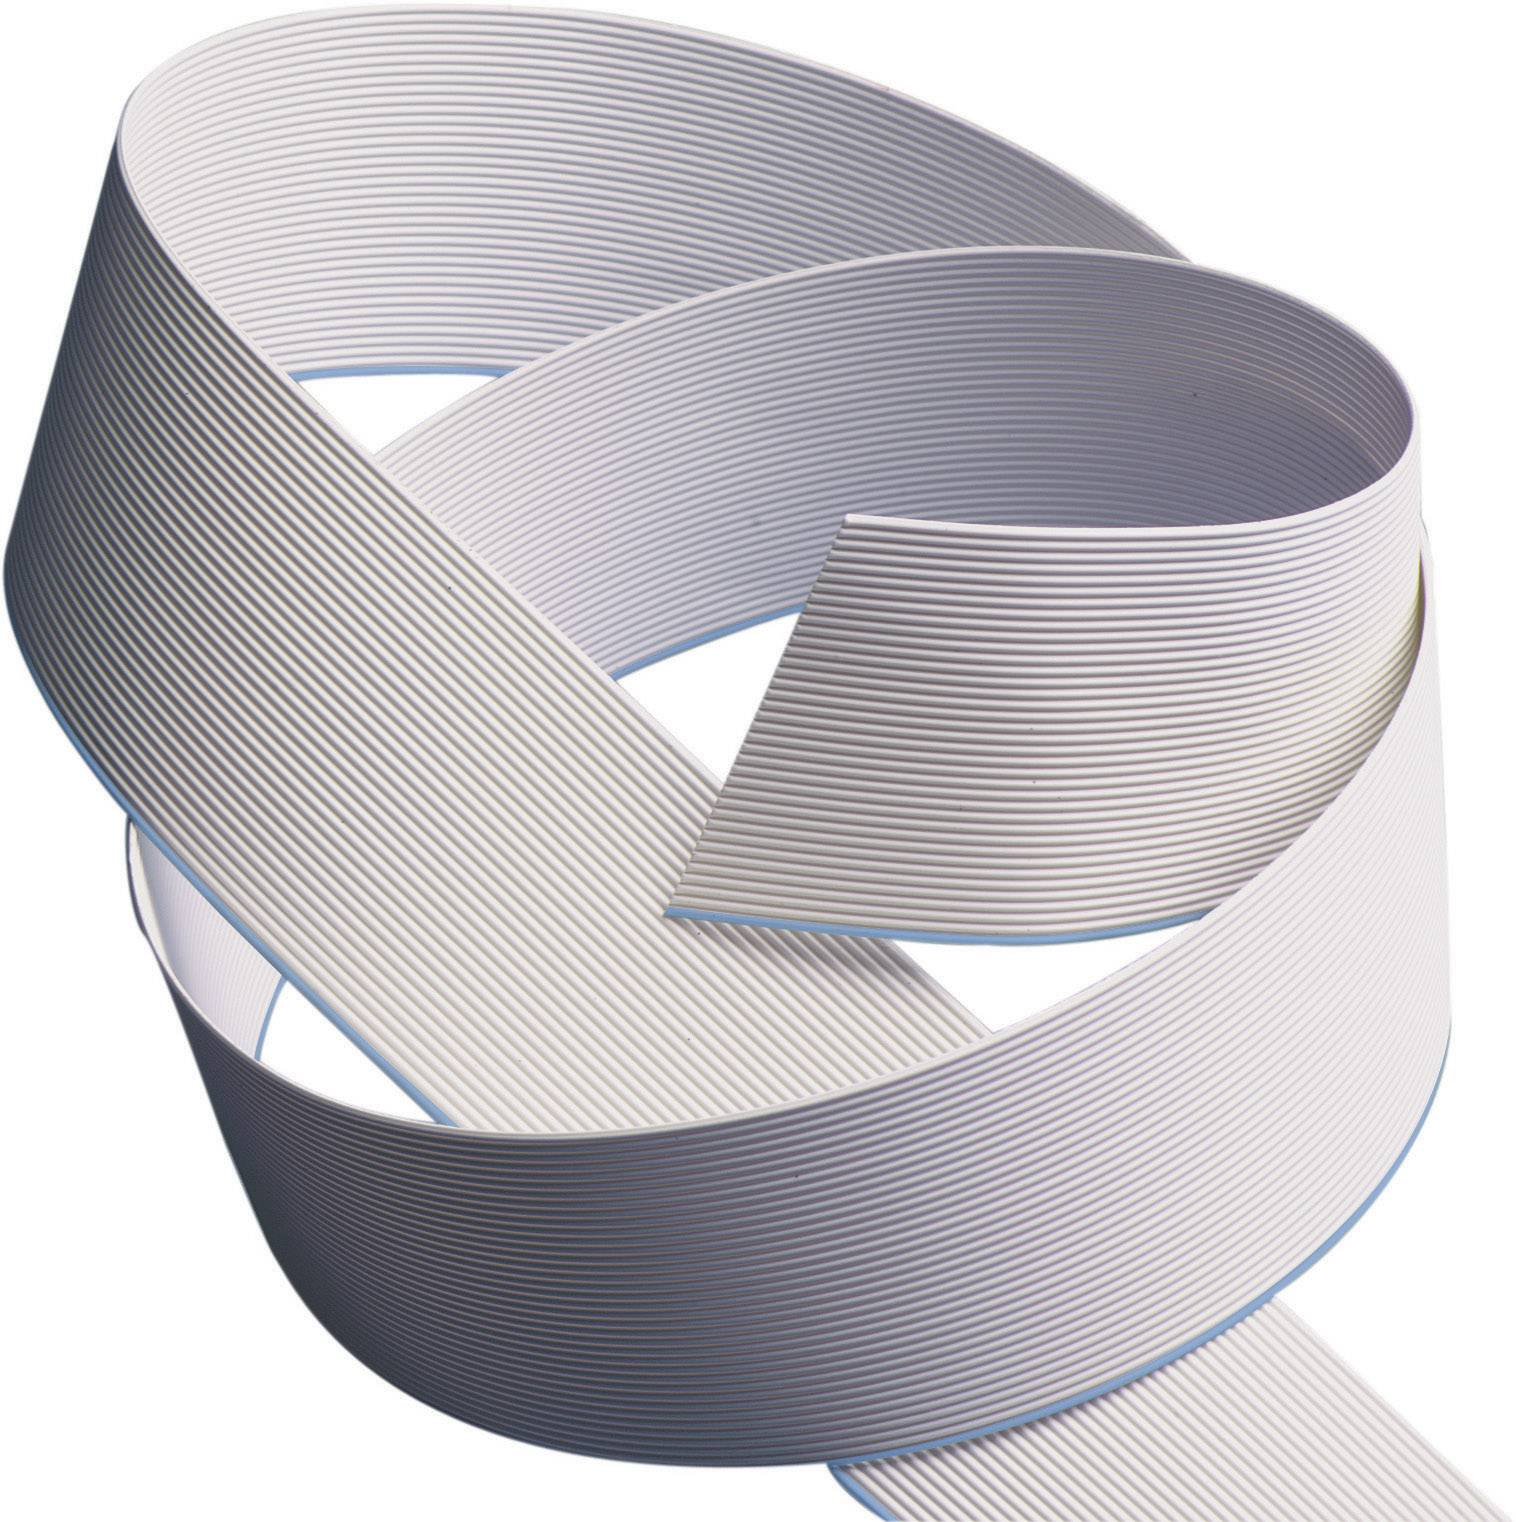 Plochý kábel 3M 7000057354, rozteč 1.27 mm, 10 x 0.08 mm², sivá, metrový tovar